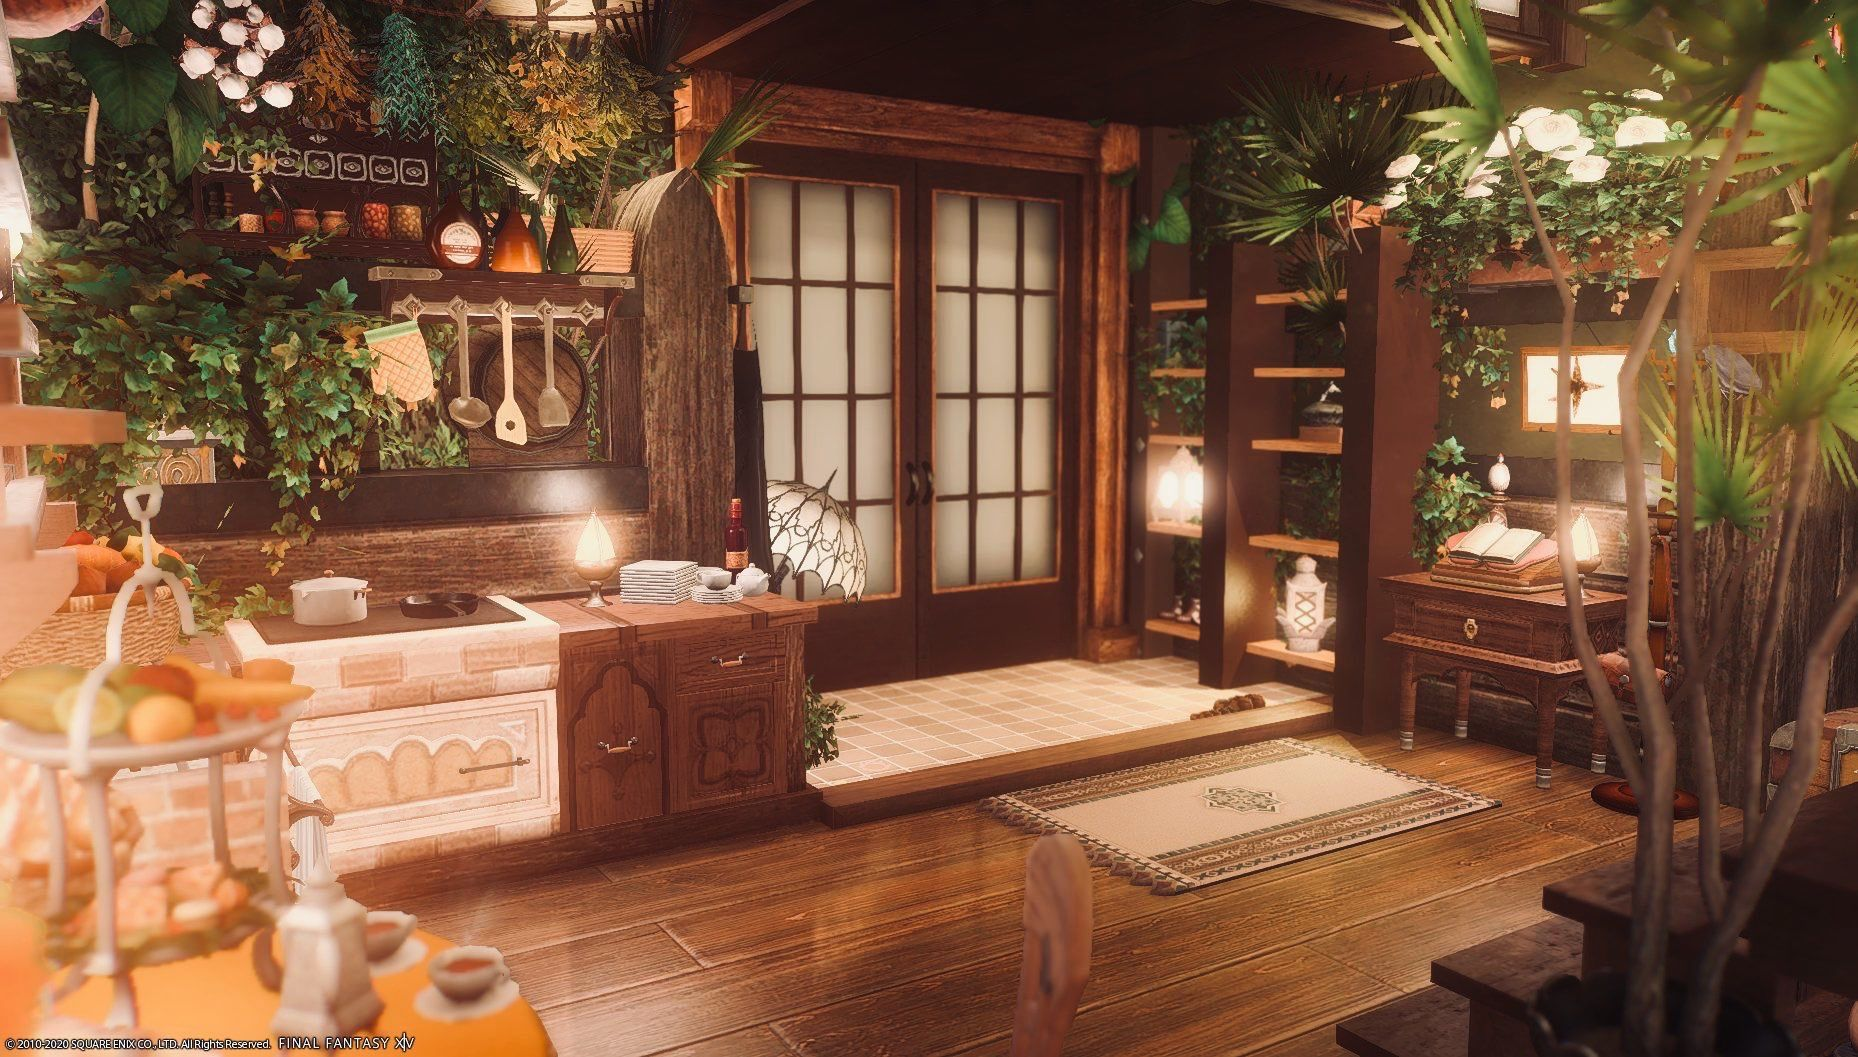 89 Ffxiv Houses Ideas In 2021 Final Fantasy Xiv Fantasy House Final Fantasy 14